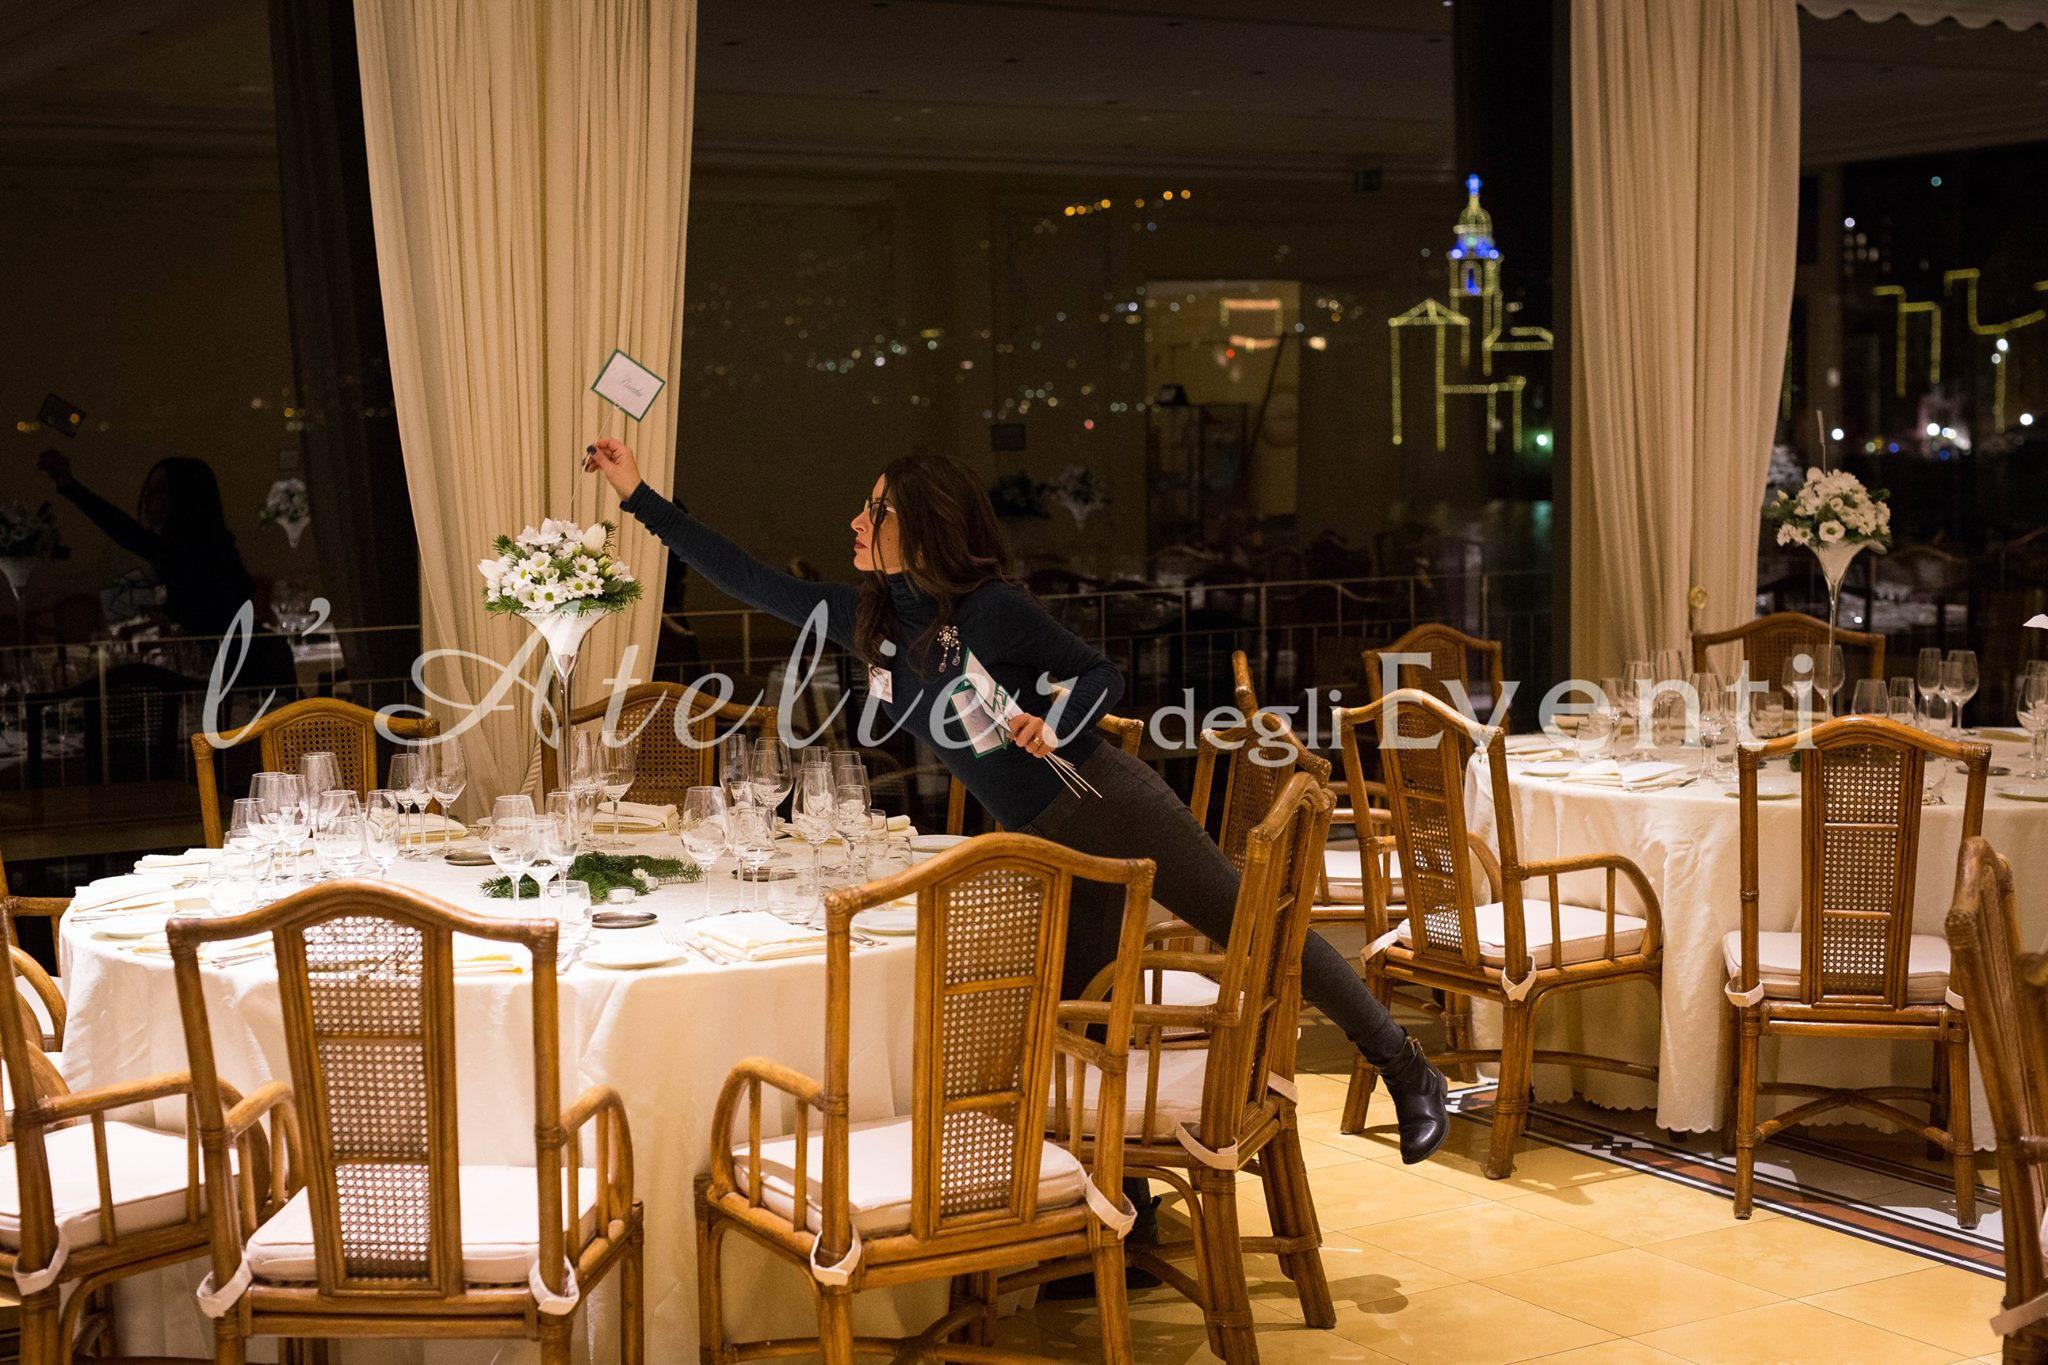 matrimonio_centrotavola_fiori_floreale_liguria_camogli_cenobio_ristorante